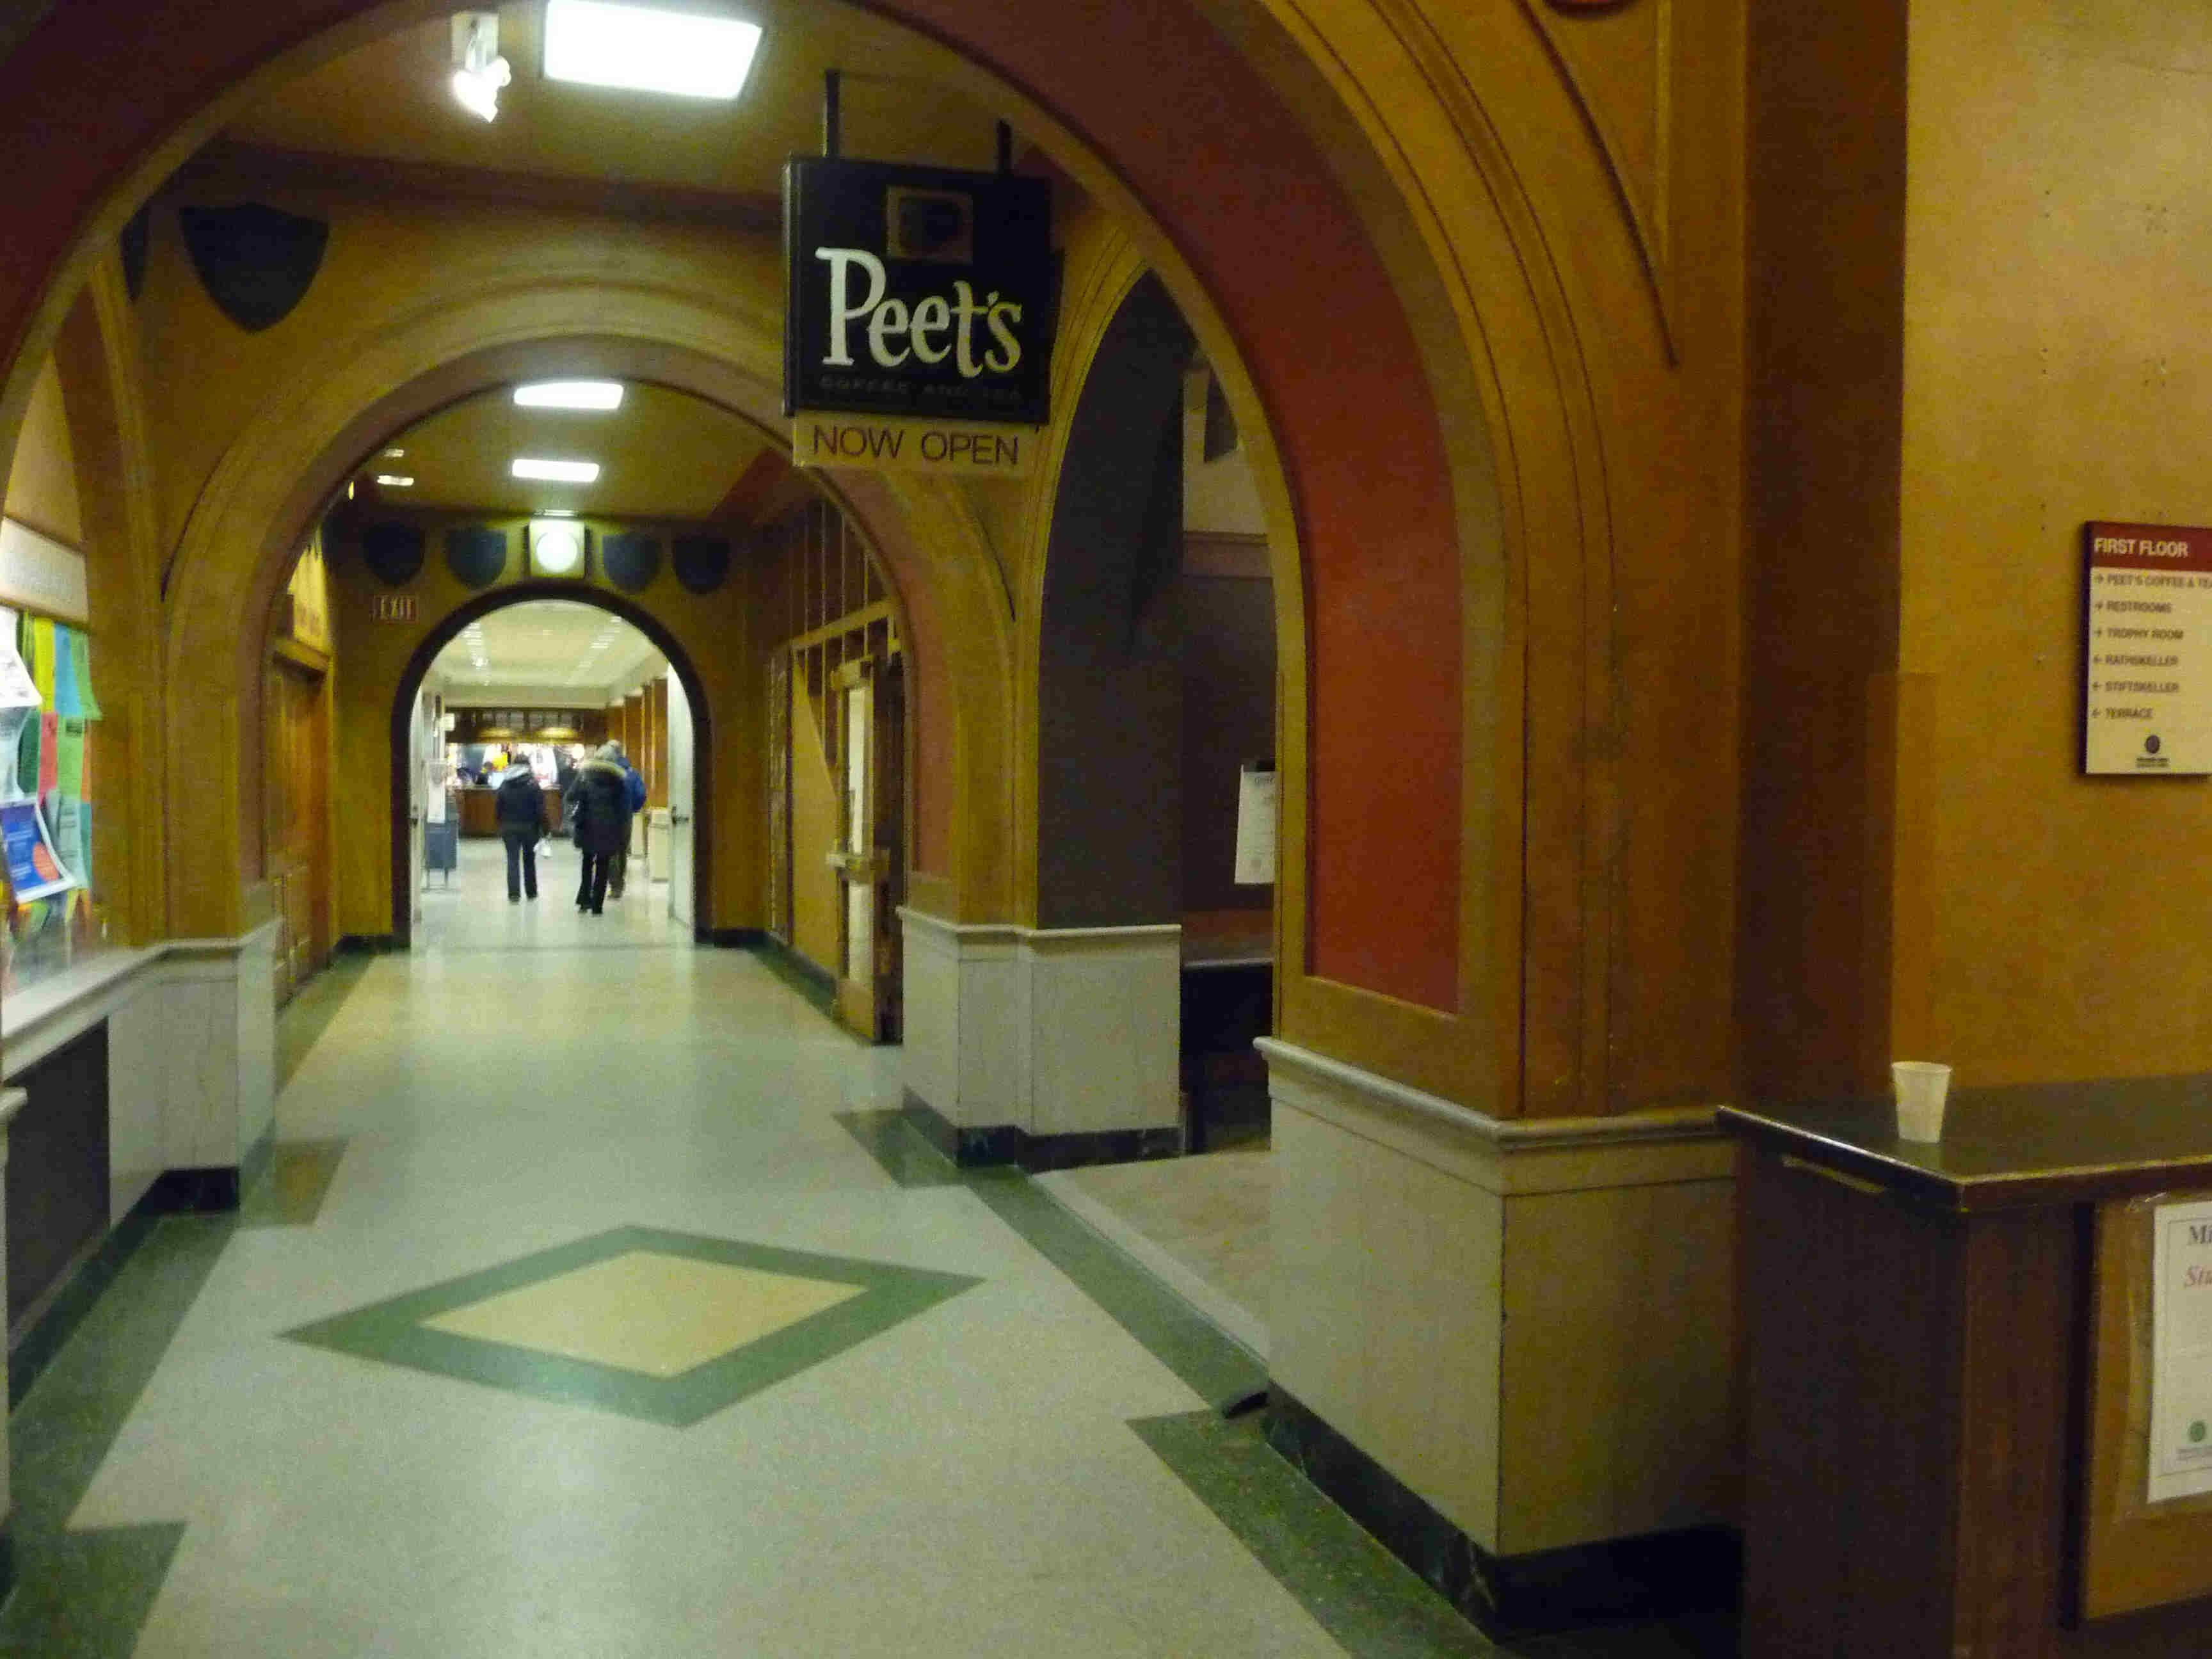 Peet's in Memorial Union on the UW campus